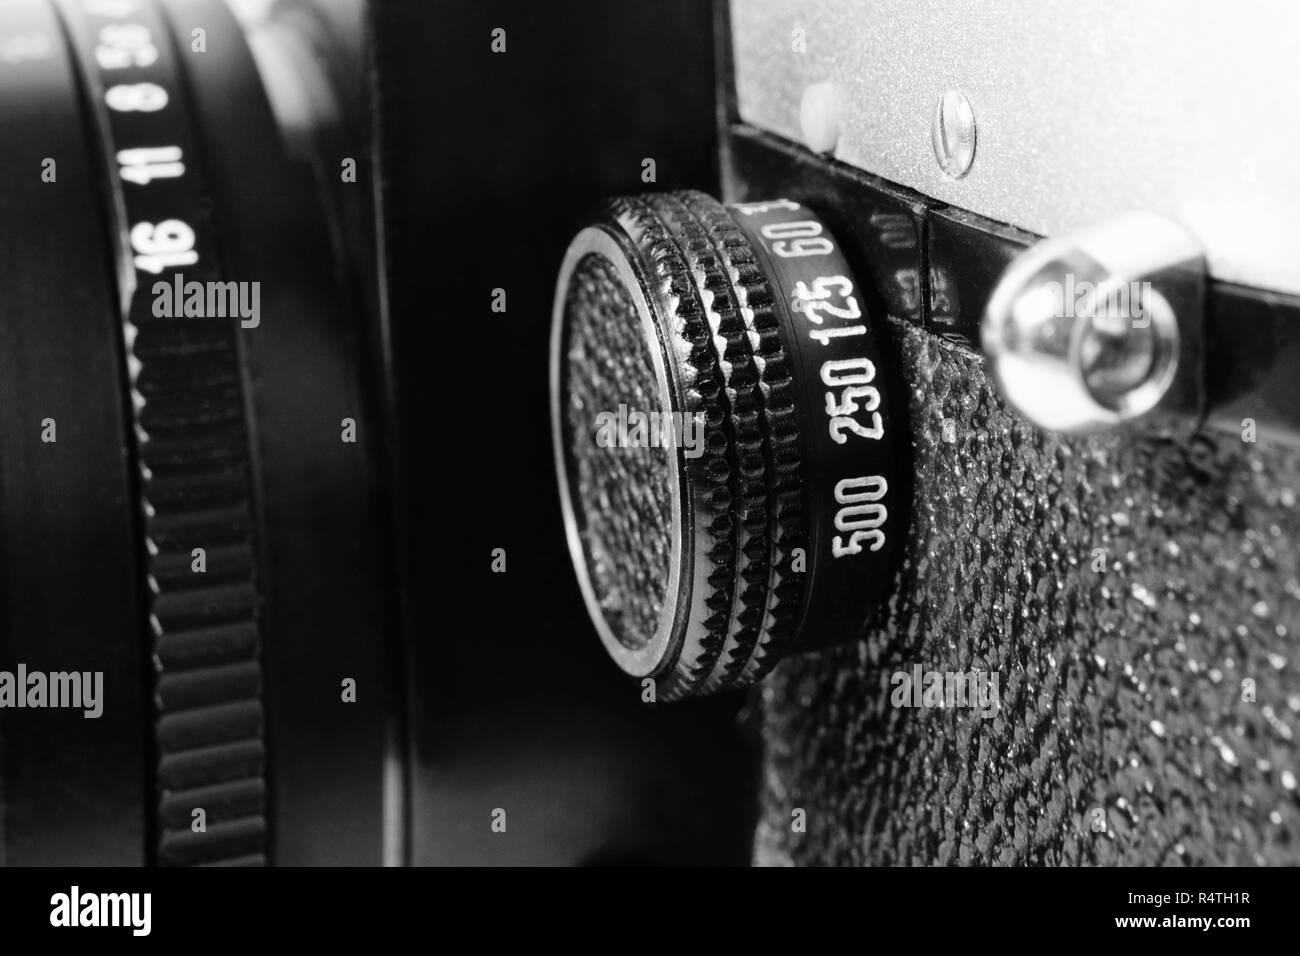 Retro camera shutter switch Shallow depth of field - Stock Image